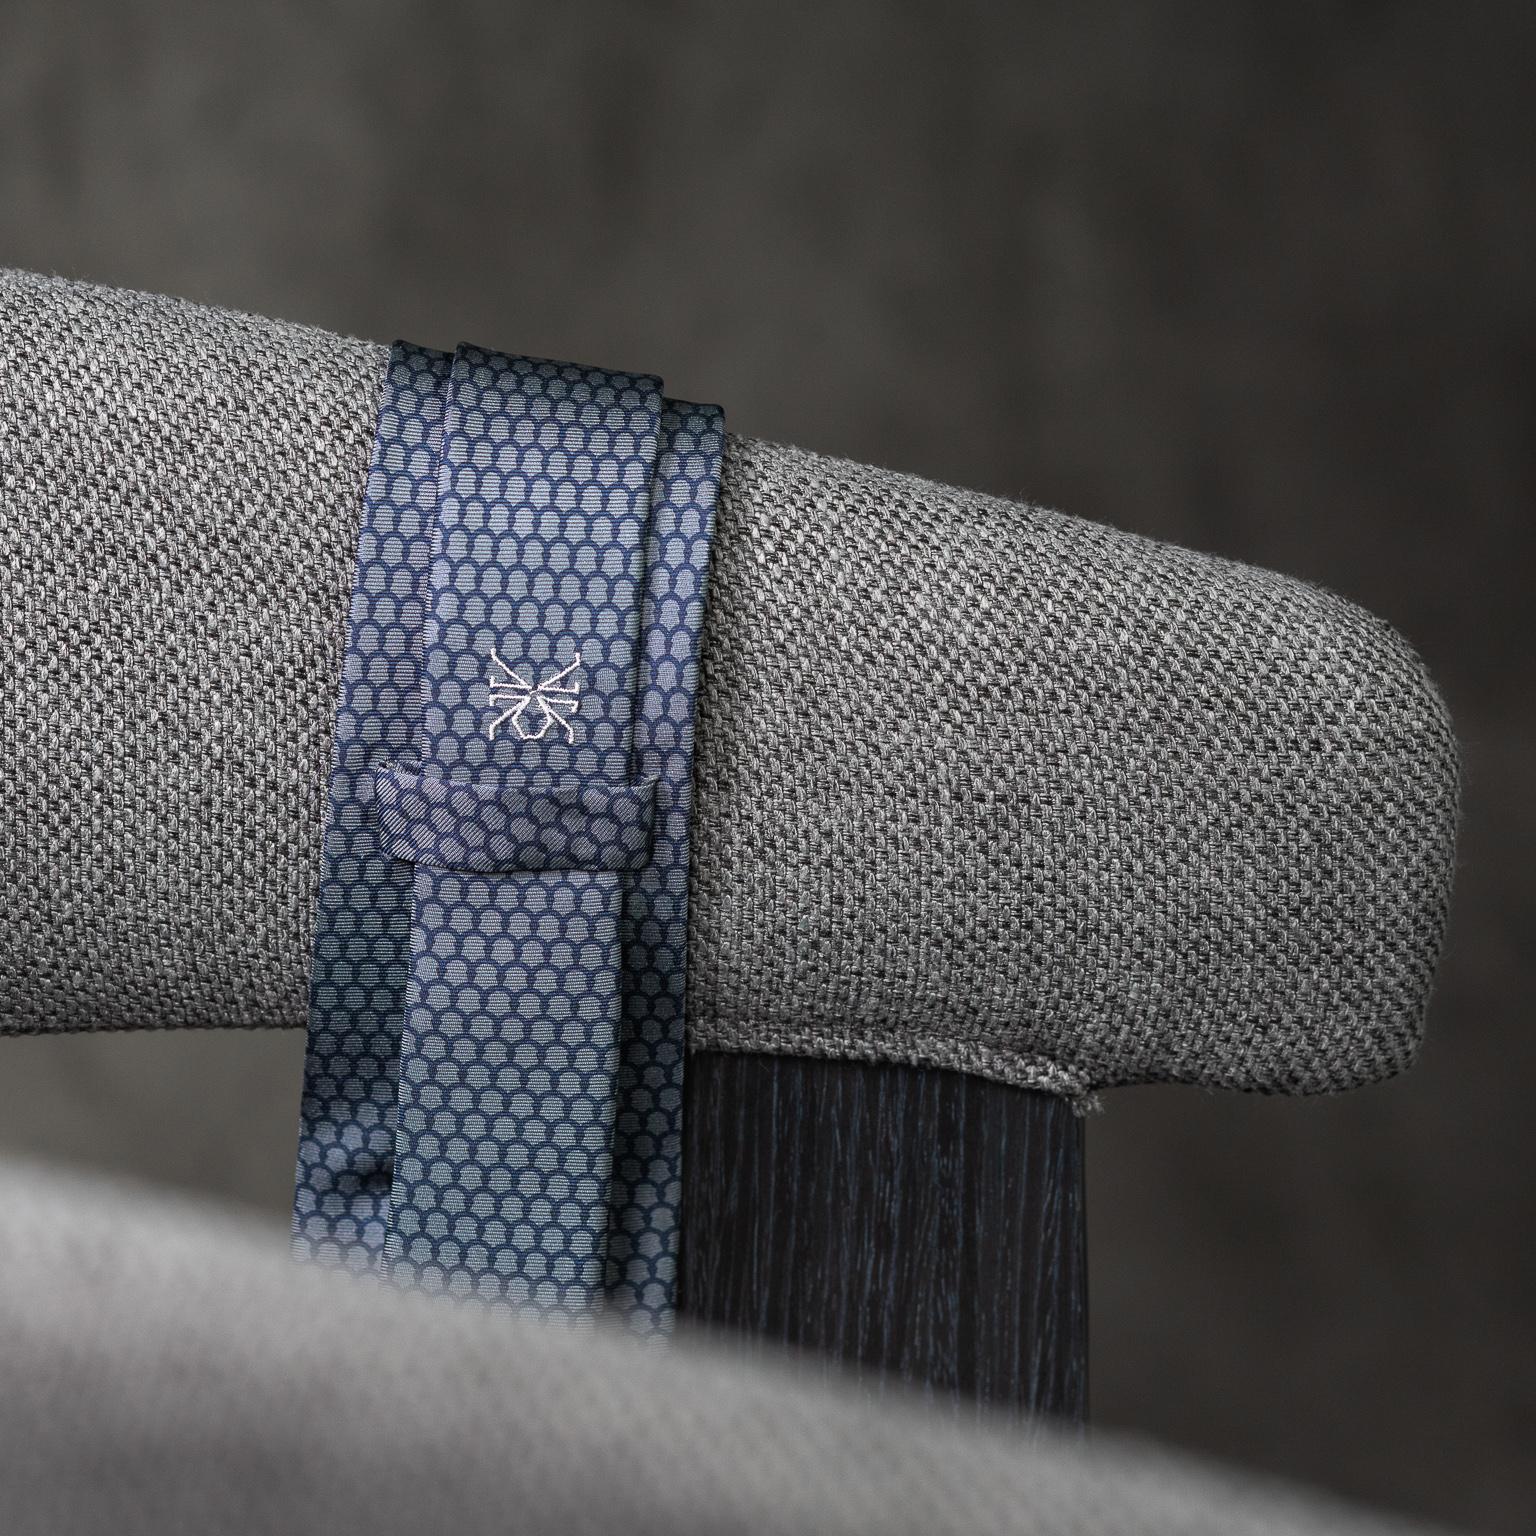 PRINTED-SILK-SEDA-ESTAMPADA-0585-Tie-Initials-Corbata-Iniciales-The-Seelk-4